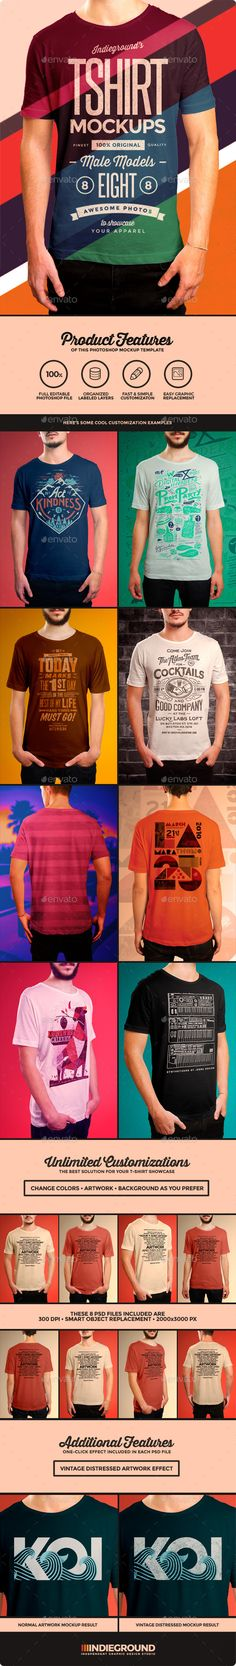 Men T-Shirt Mockups | t-shirtmockup #tshirtmockup | Download: http://graphicriver.net/item/men-tshirt-mockups/8933044?ref=ksioks